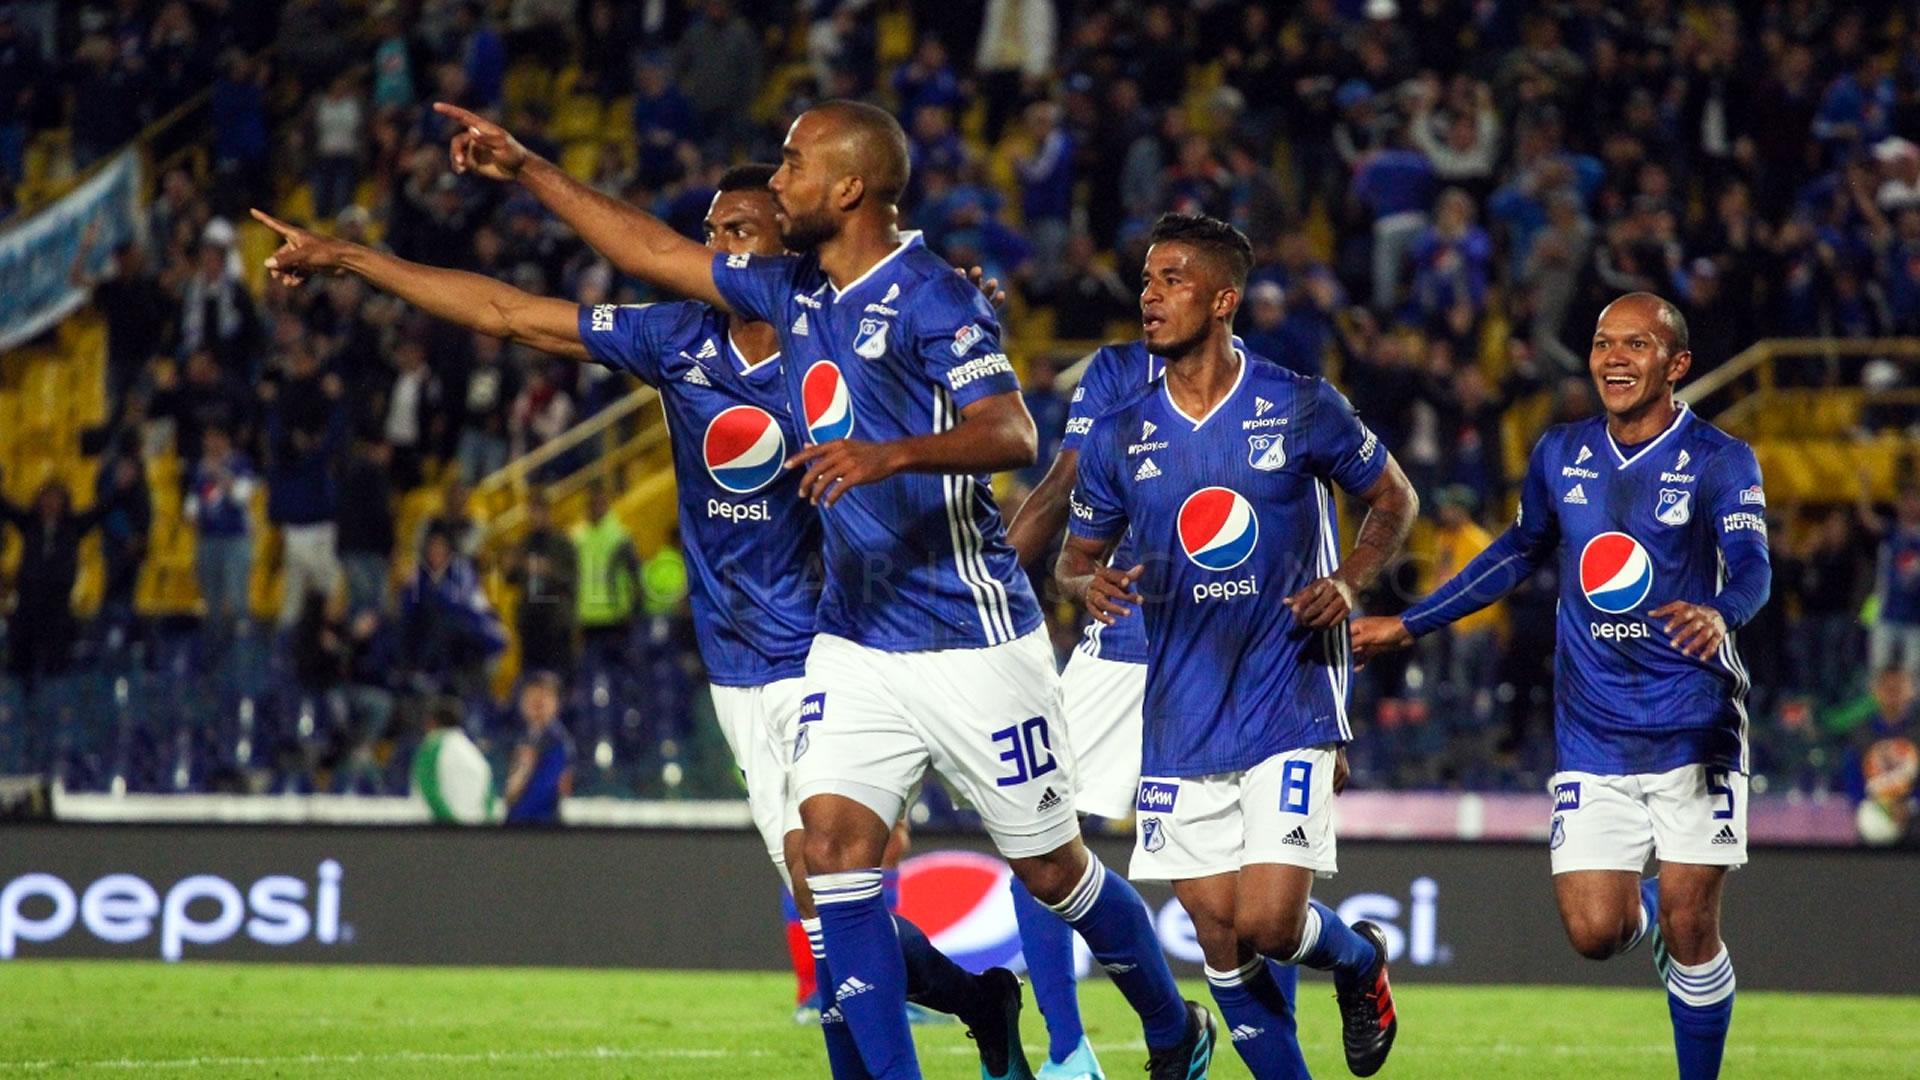 Millonarios Liga Águila 2019